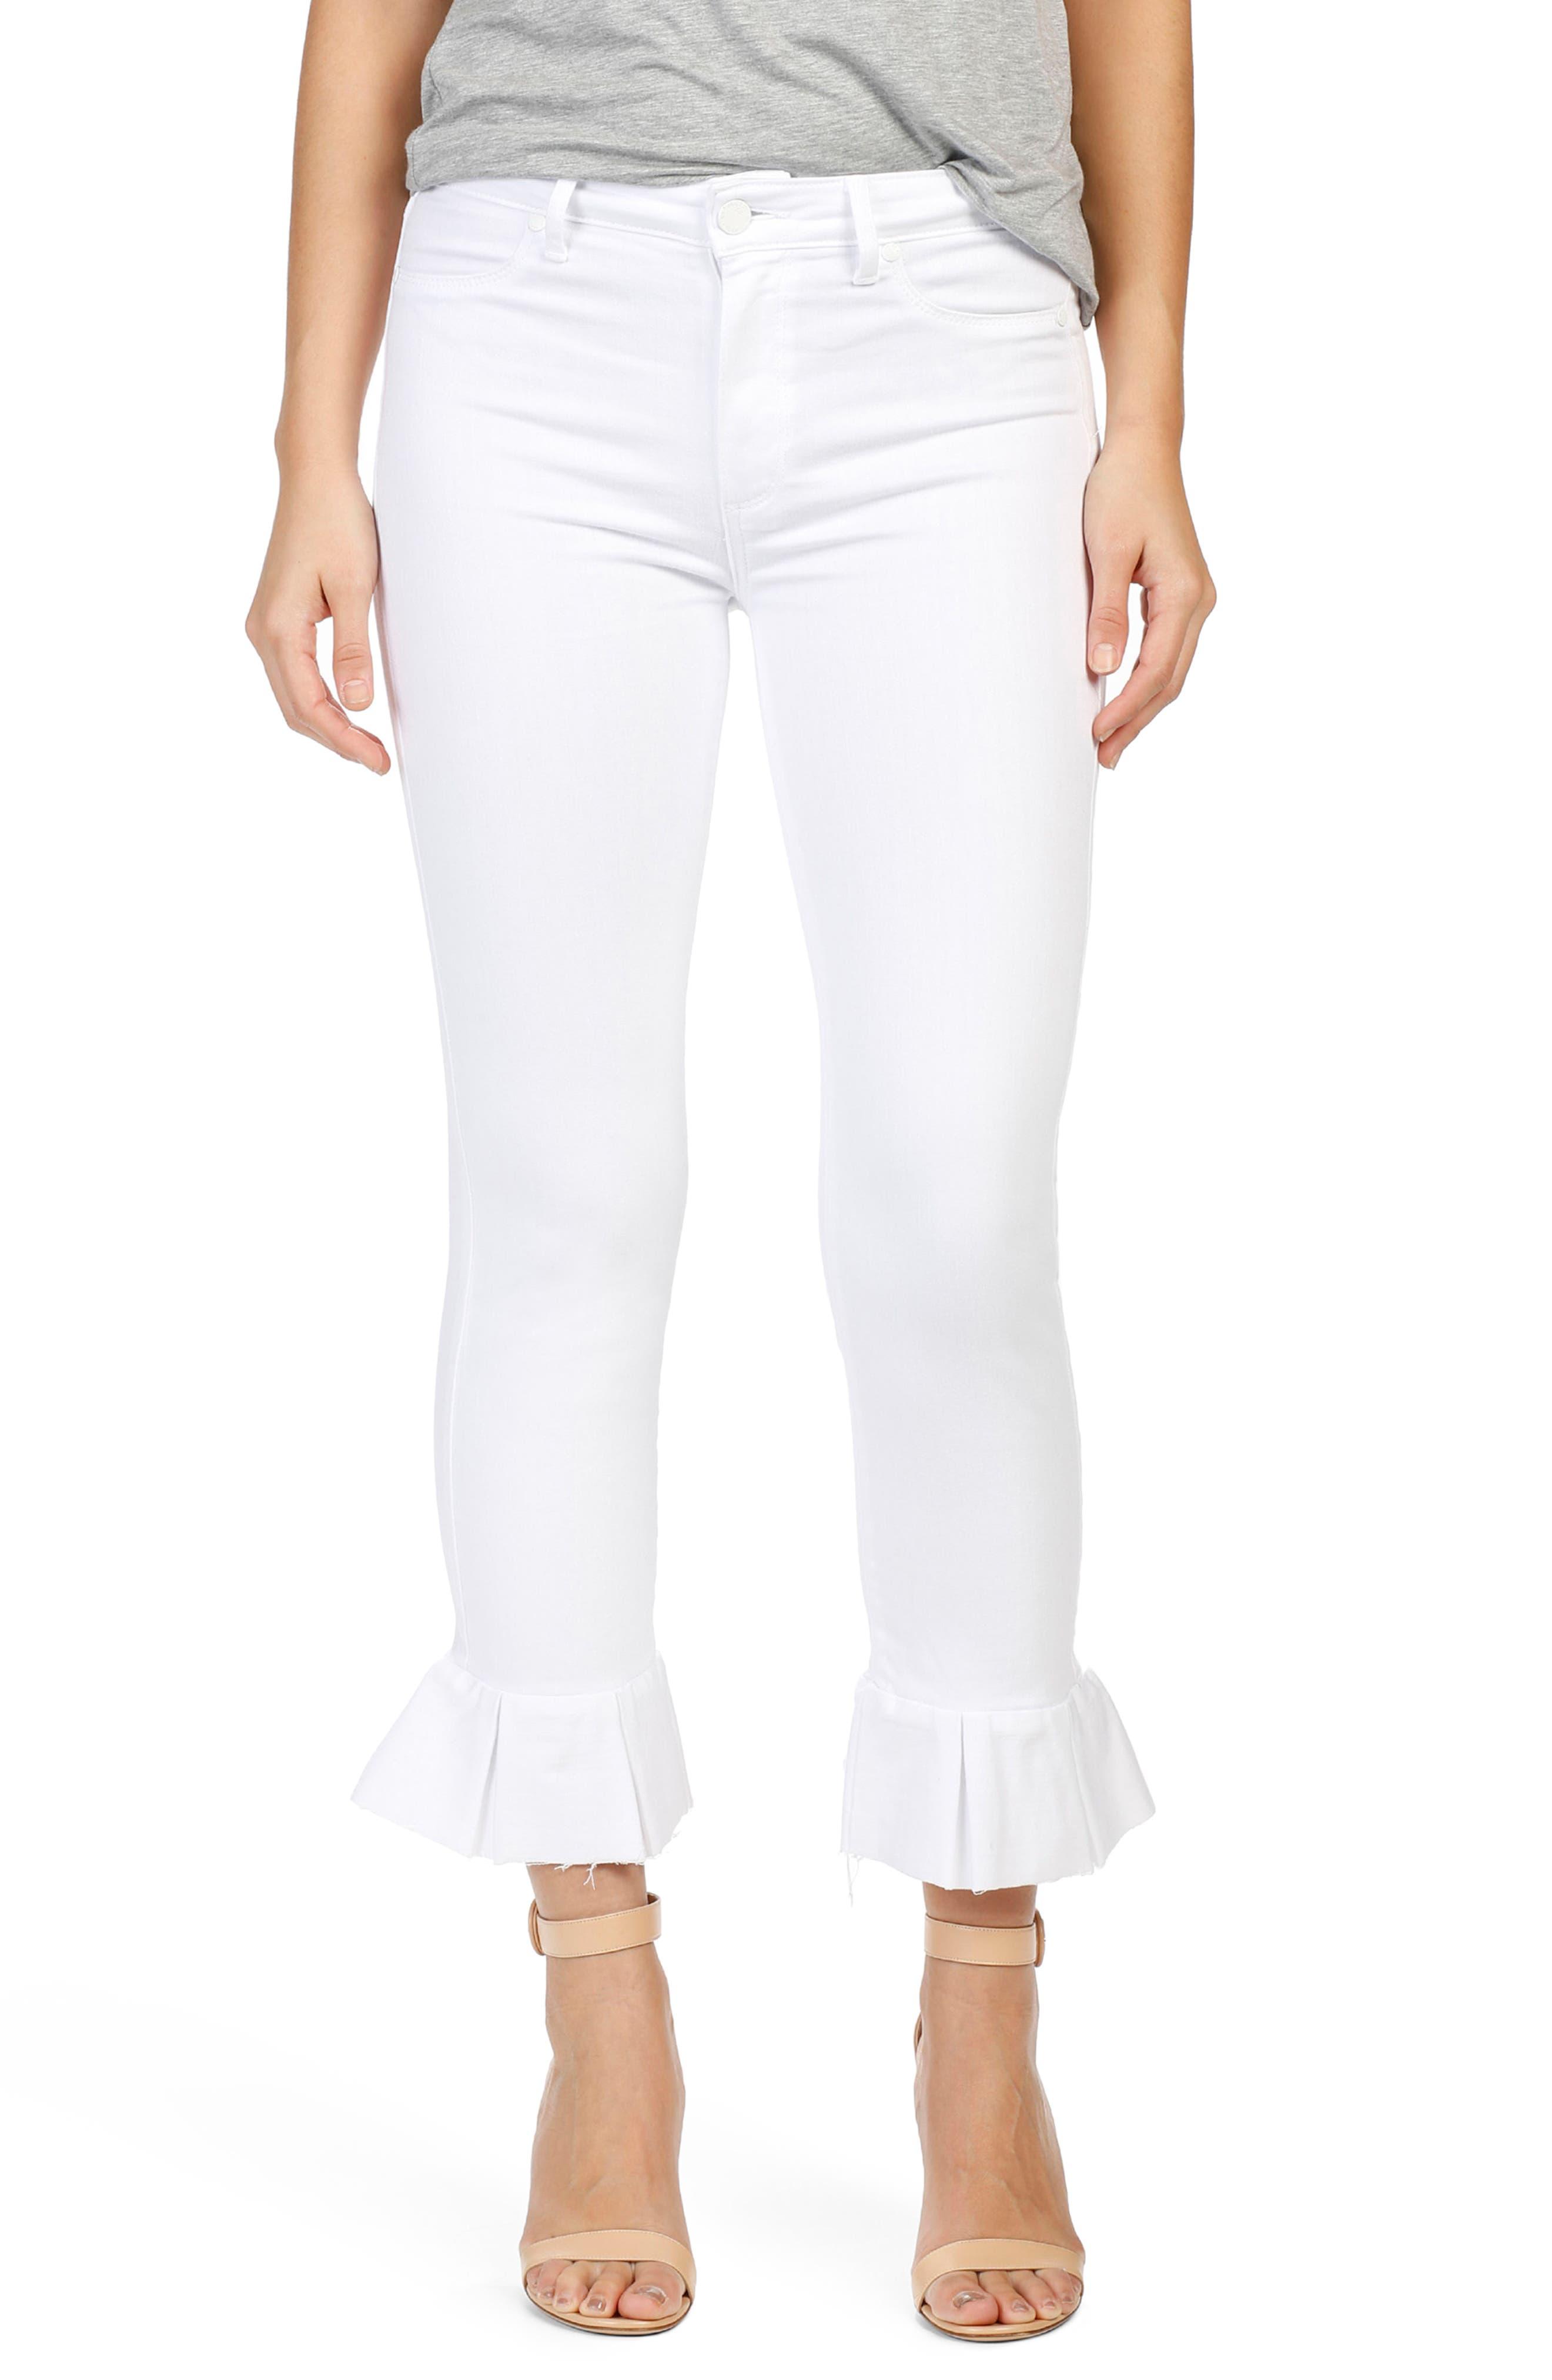 Main Image - PAIGE Rafaela High Waist Raw Hem Ankle Ultra Skinny Jeans (Optic White)